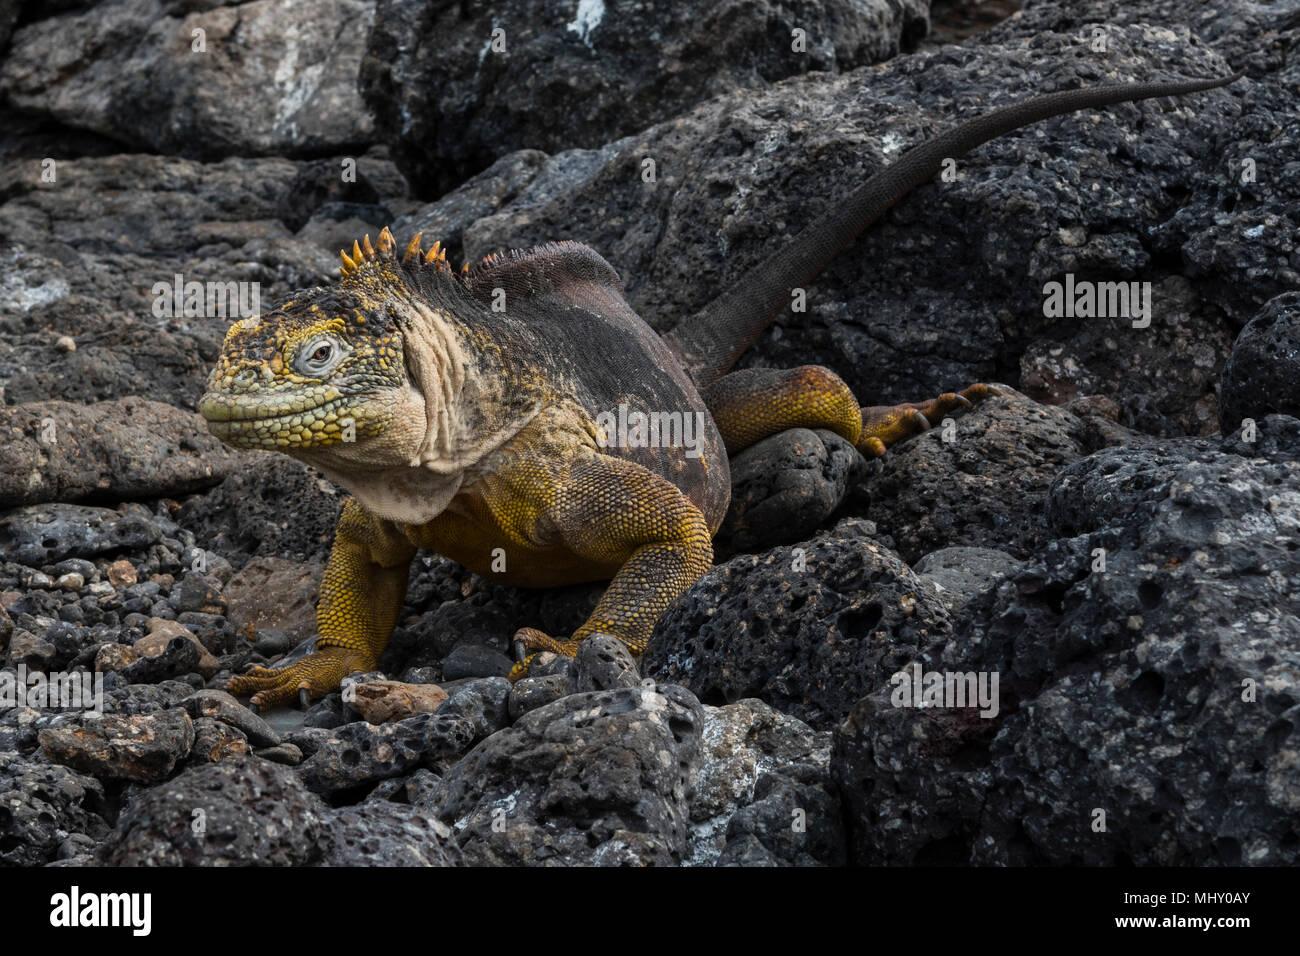 Land Iguana (Conolophus subcristatus) sulle rocce, South Plaza Island, Isole Galapagos, Ecuador Immagini Stock